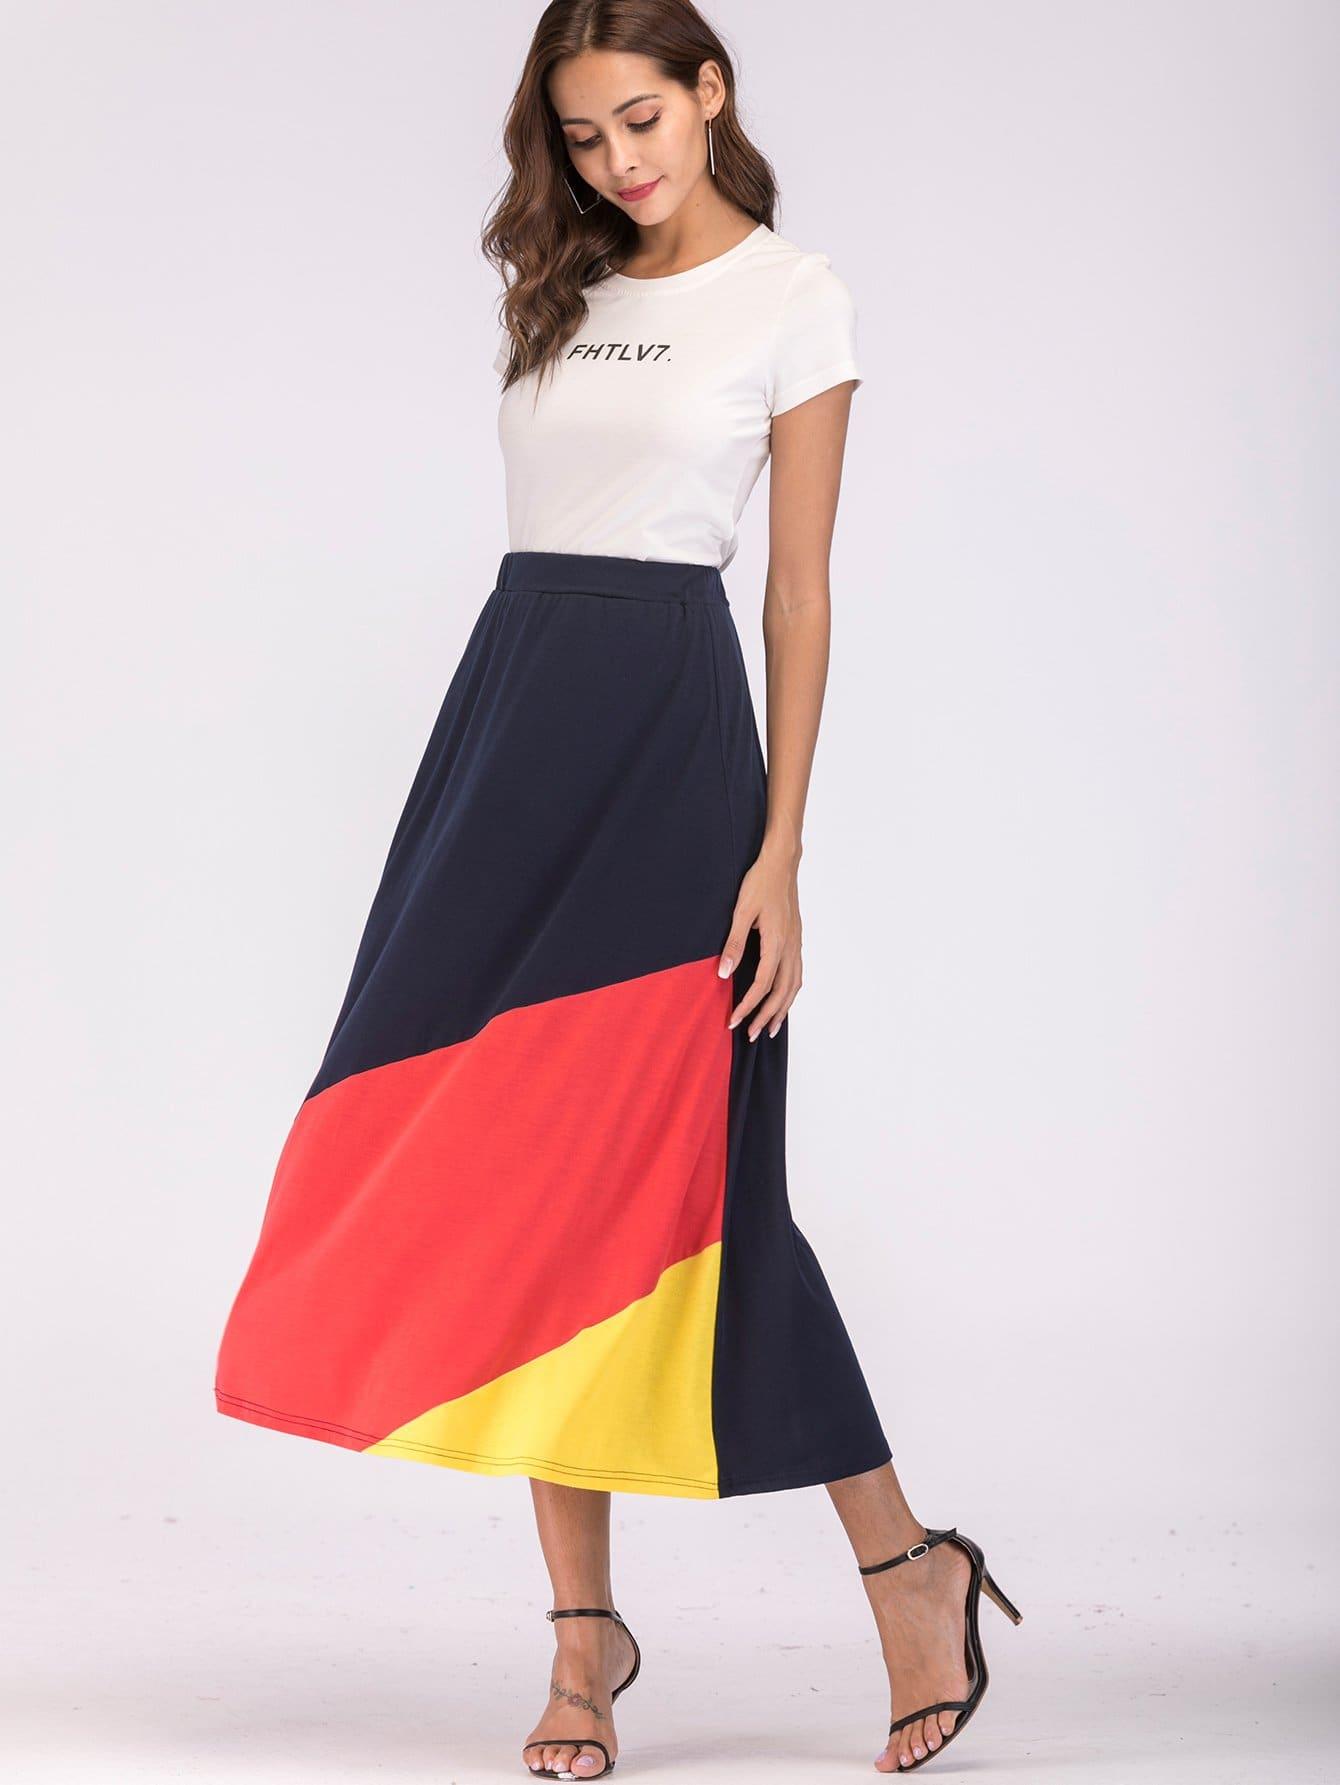 Color Block Skirt